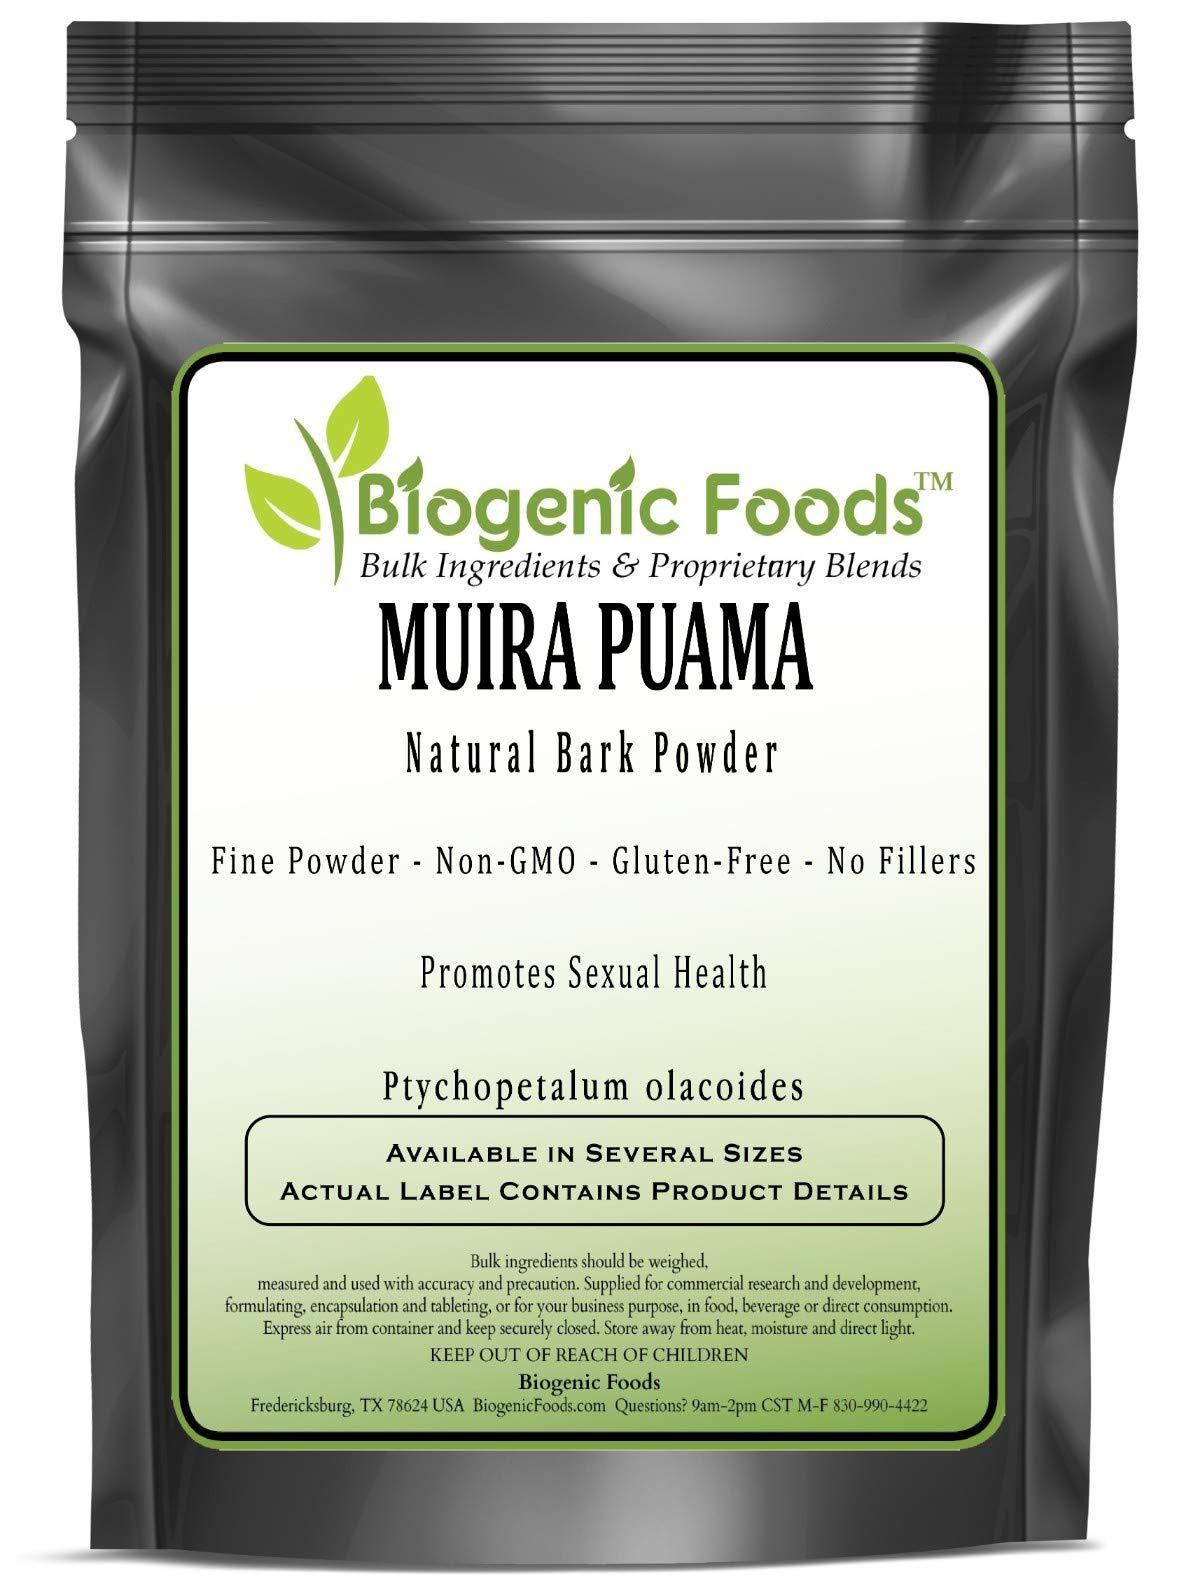 Muira Puama - Natural Bark Powder (Ptychopetalum olacoides), 10 kg